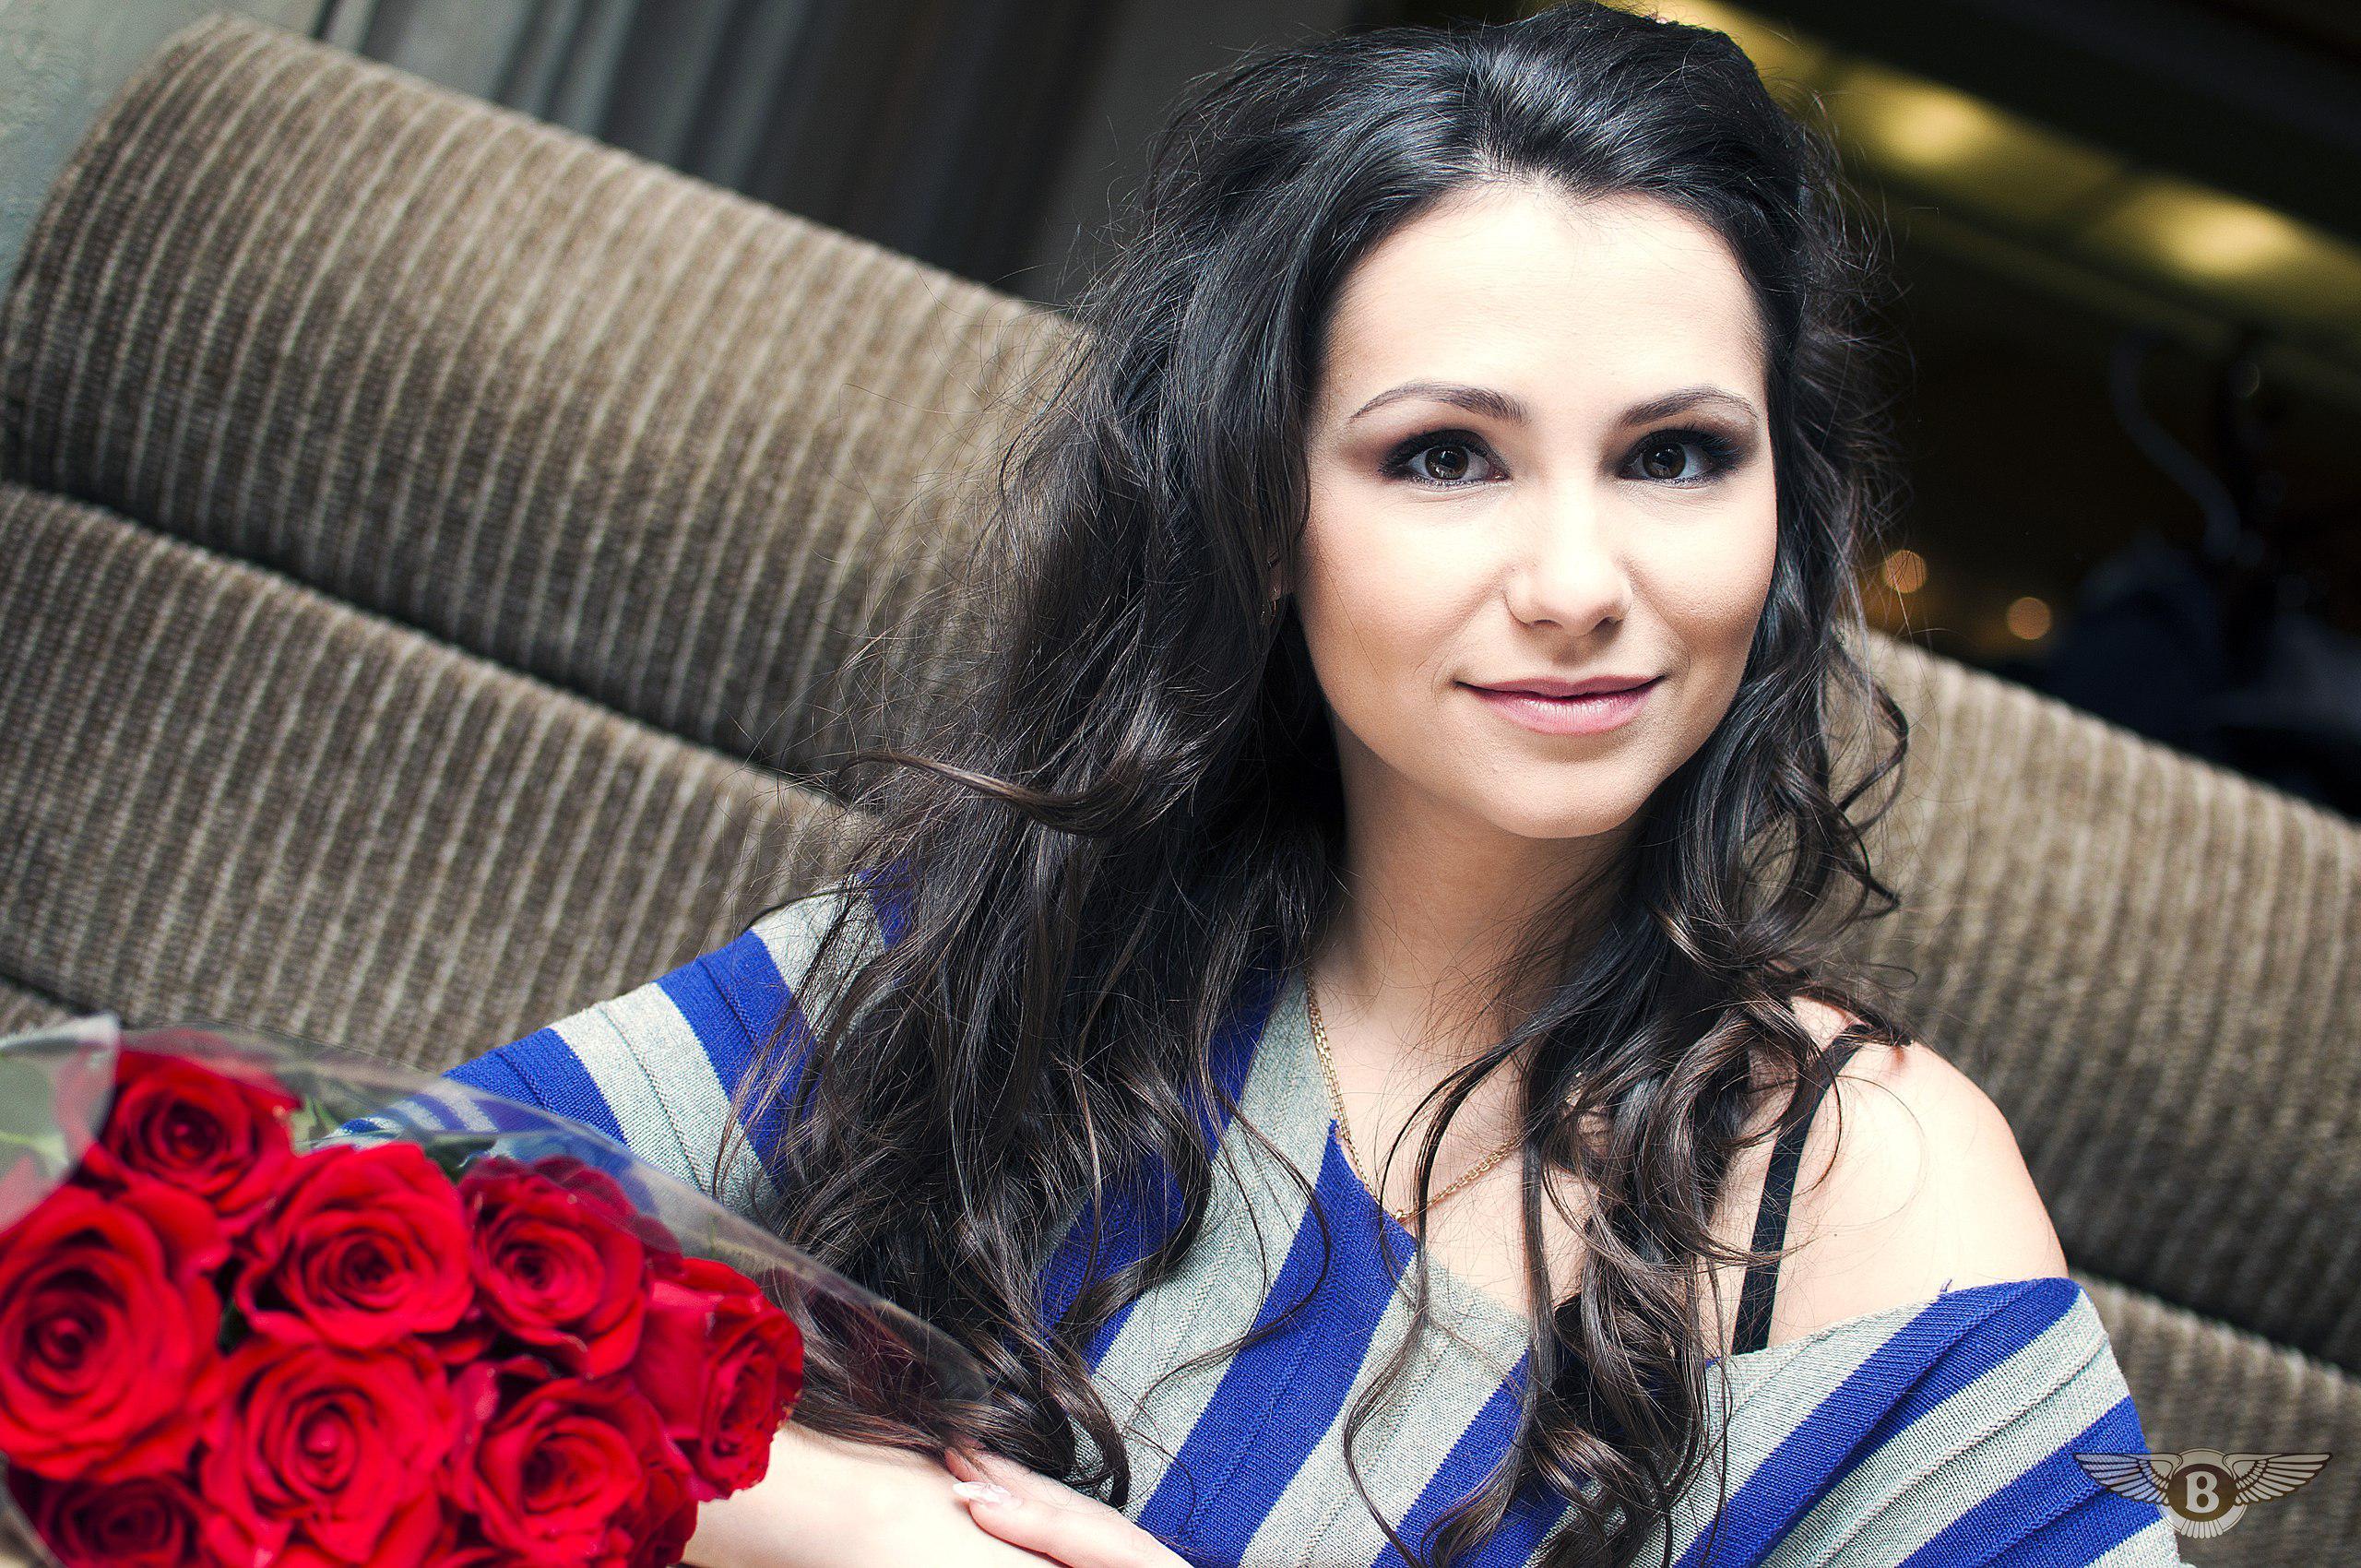 svezhie-porno-ukraina